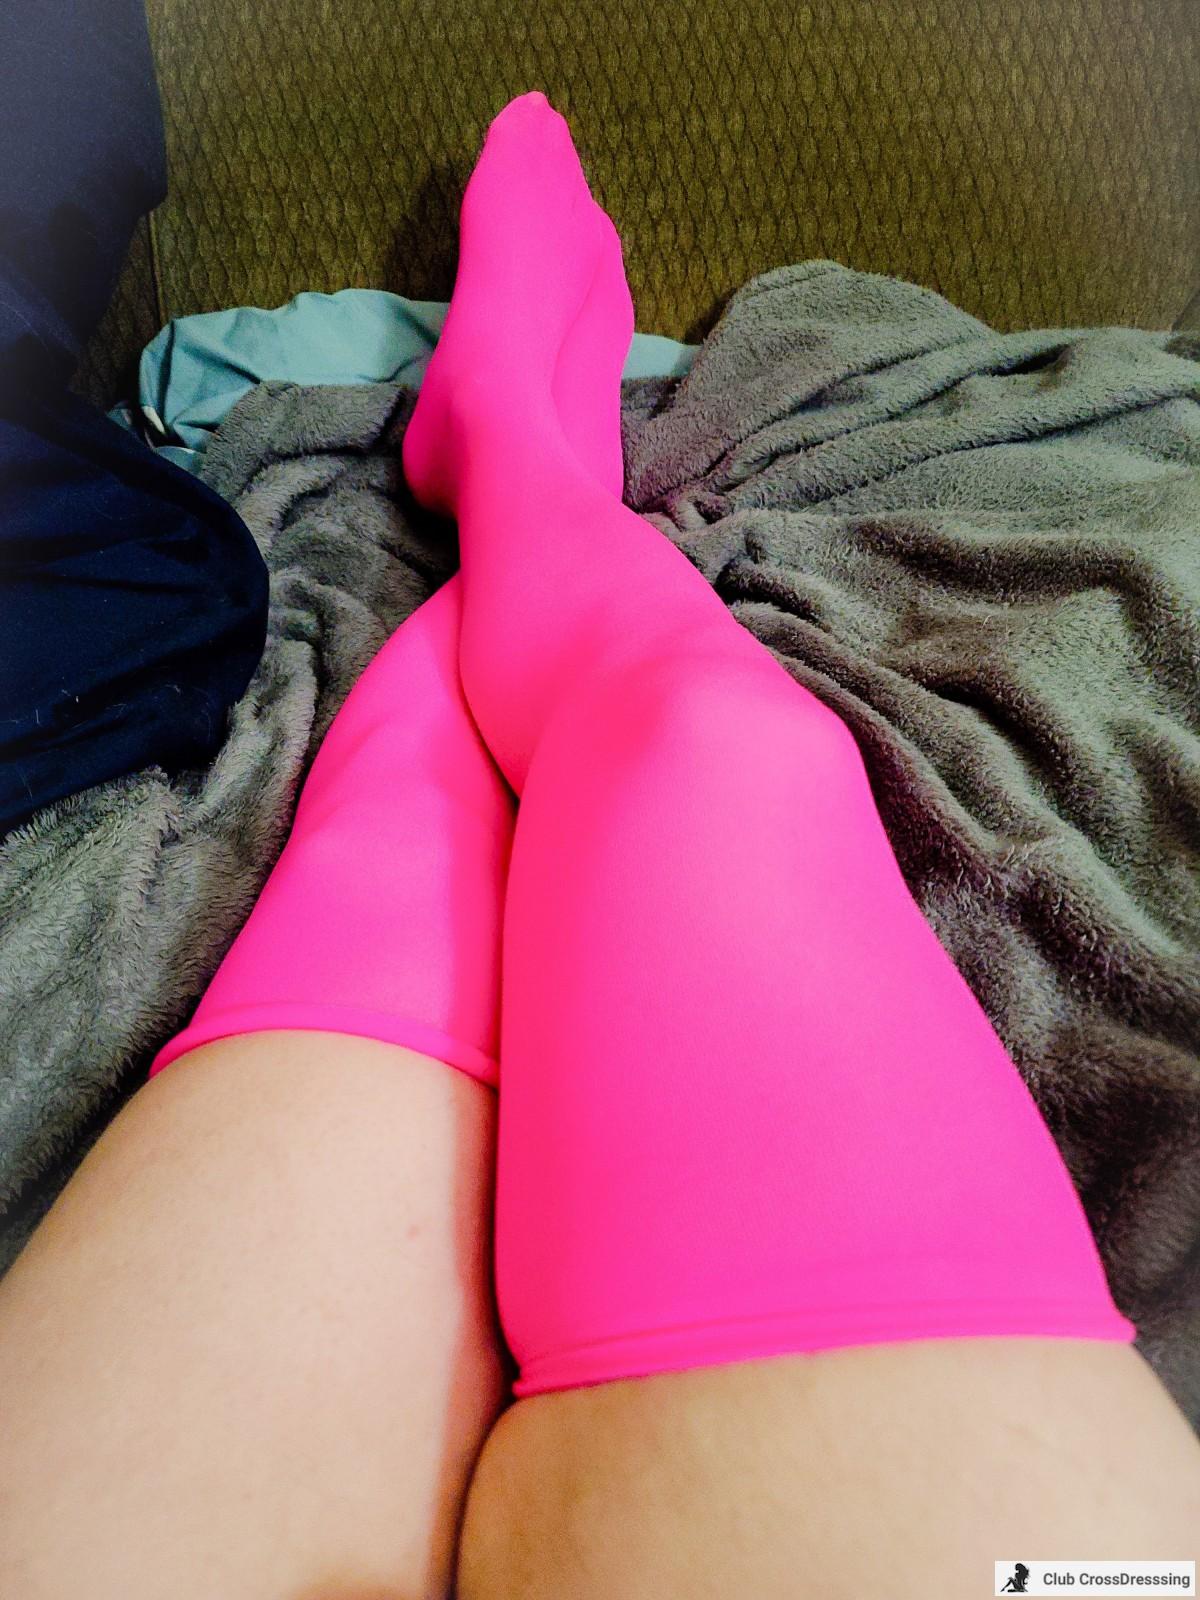 Legs in pink.